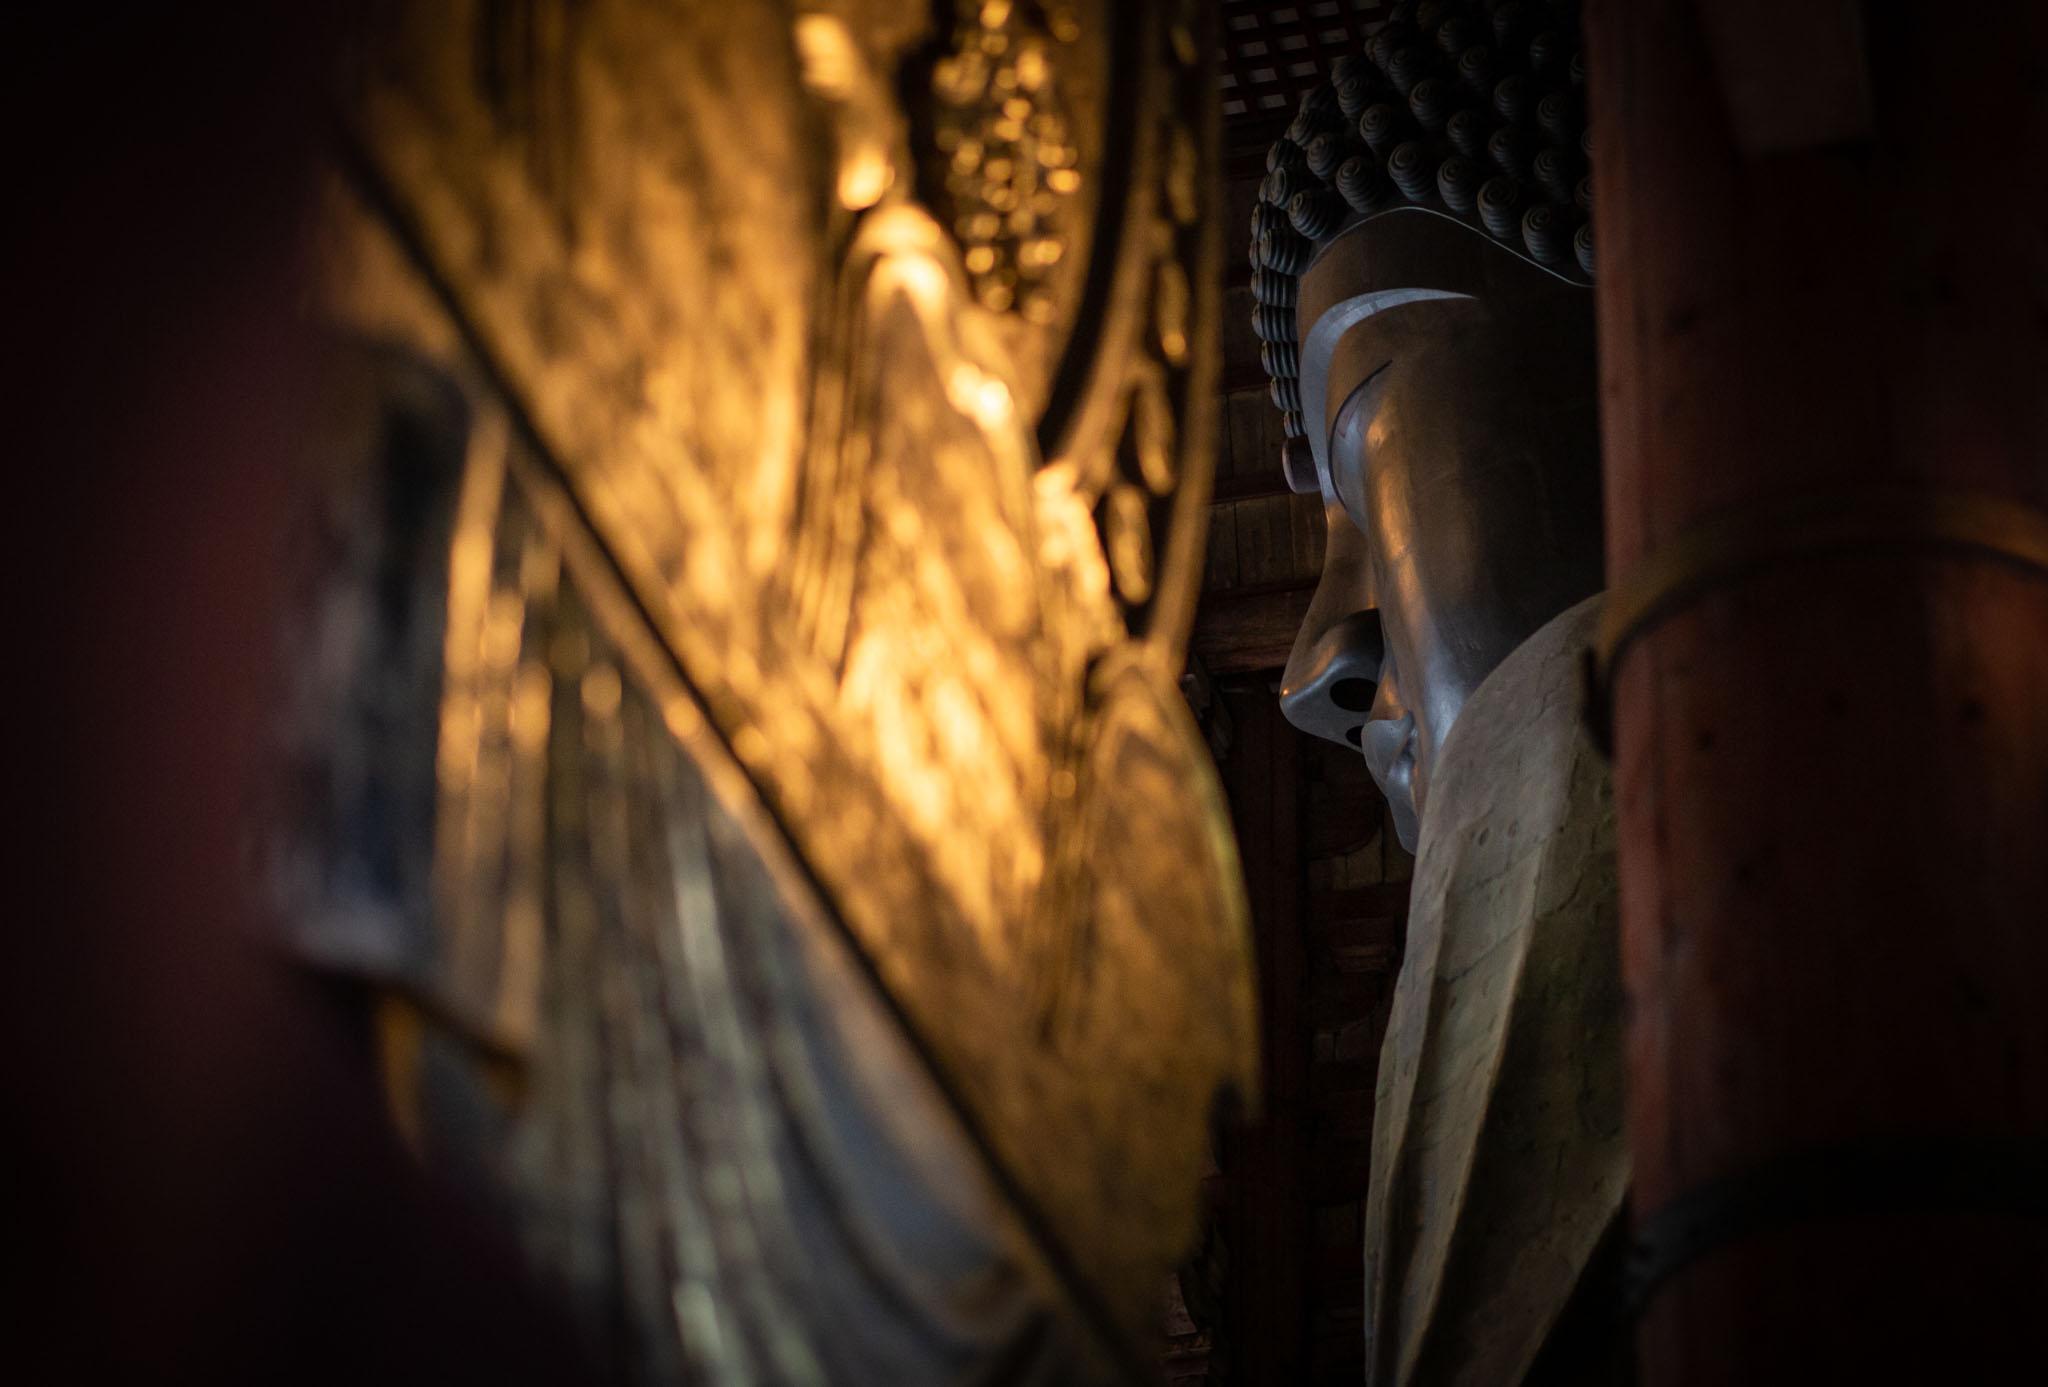 Buddha-Statue-in-the-temple-of-Tōdai-ji-in-Nara.jpg